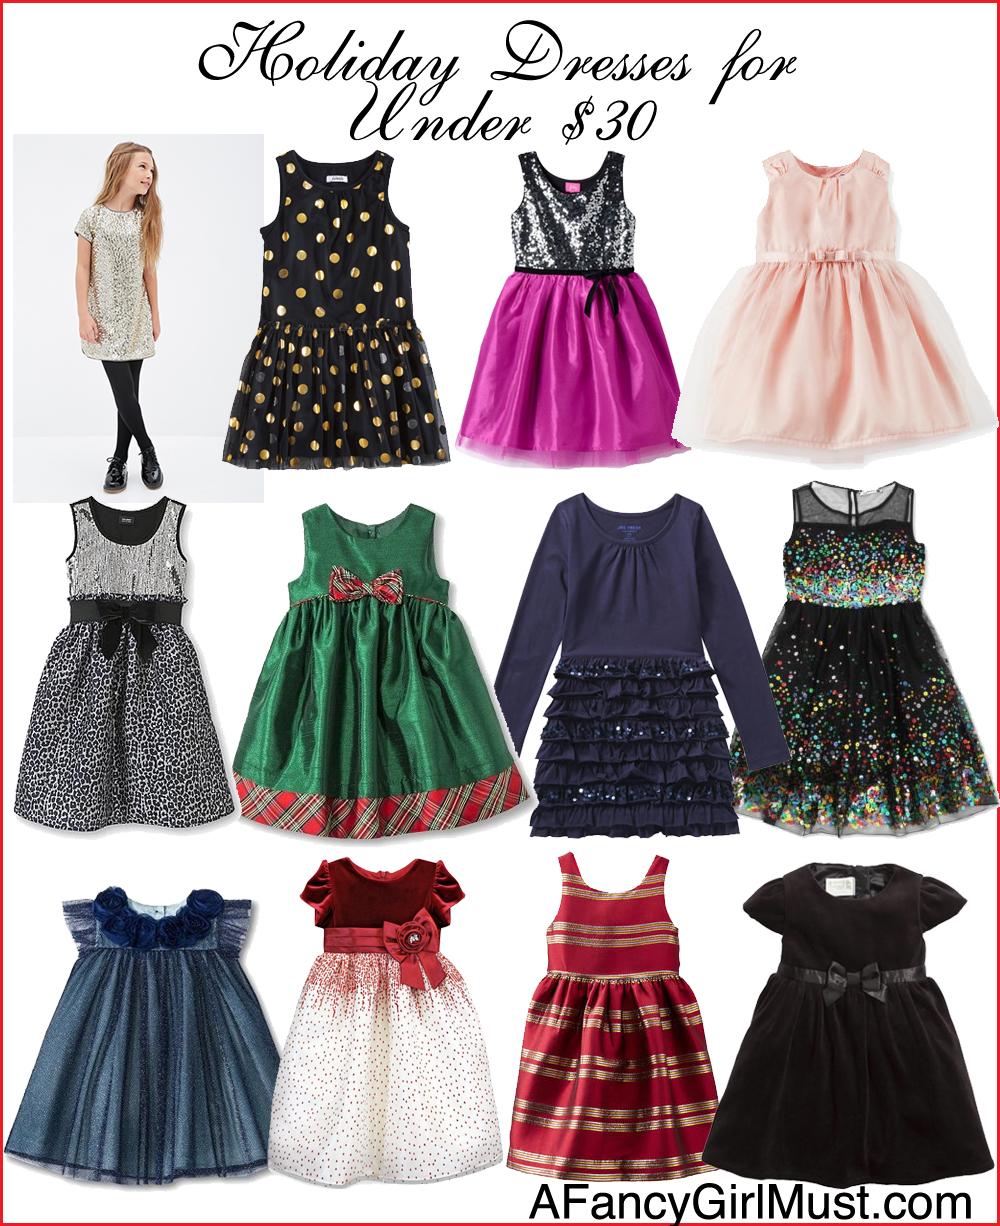 Holiday Dresses for Girls for Under $30 | AFancyGirlMust.com